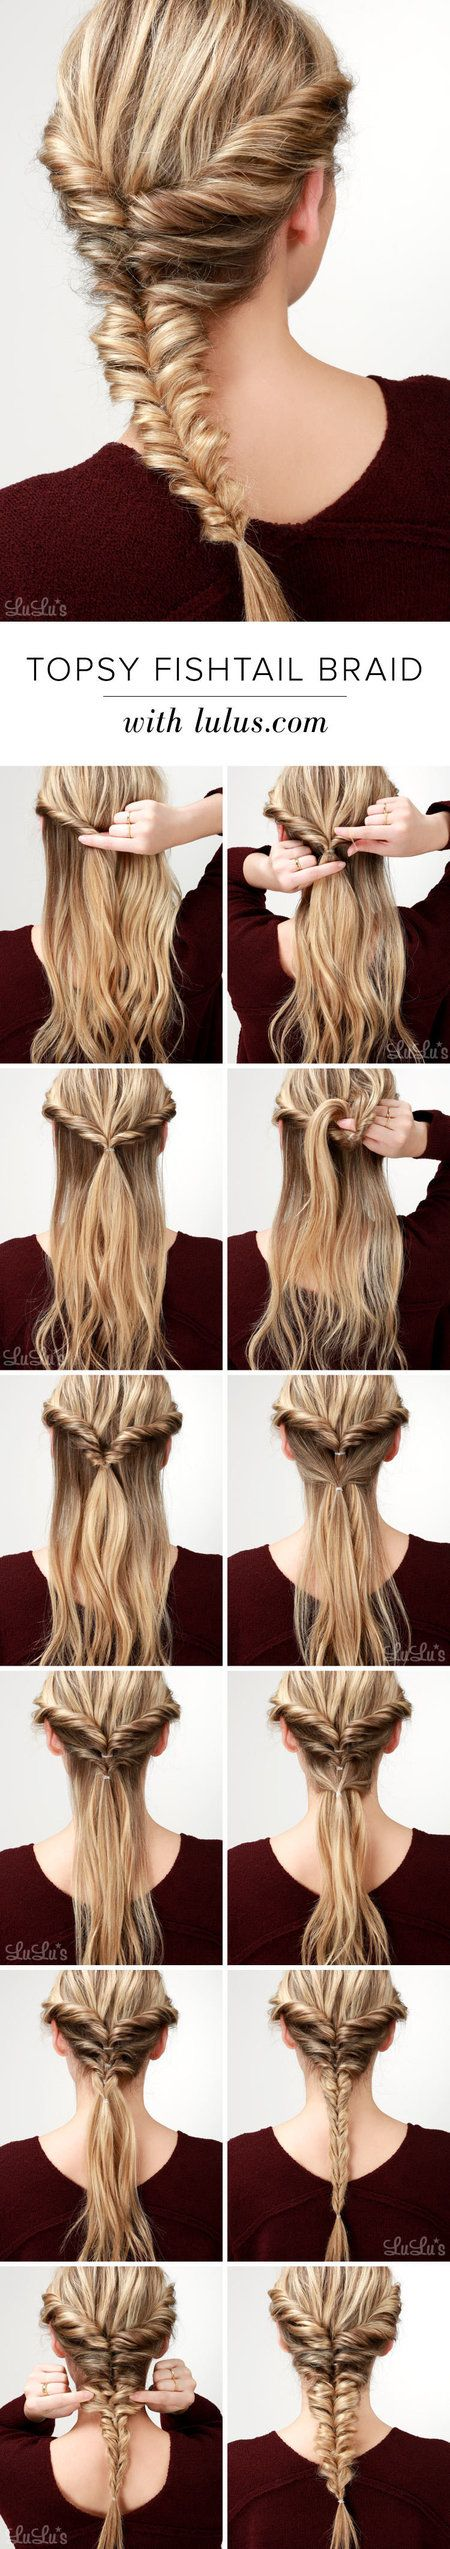 How-To: Topsy Fishtail Braid Tutorial - Georgina Waltz